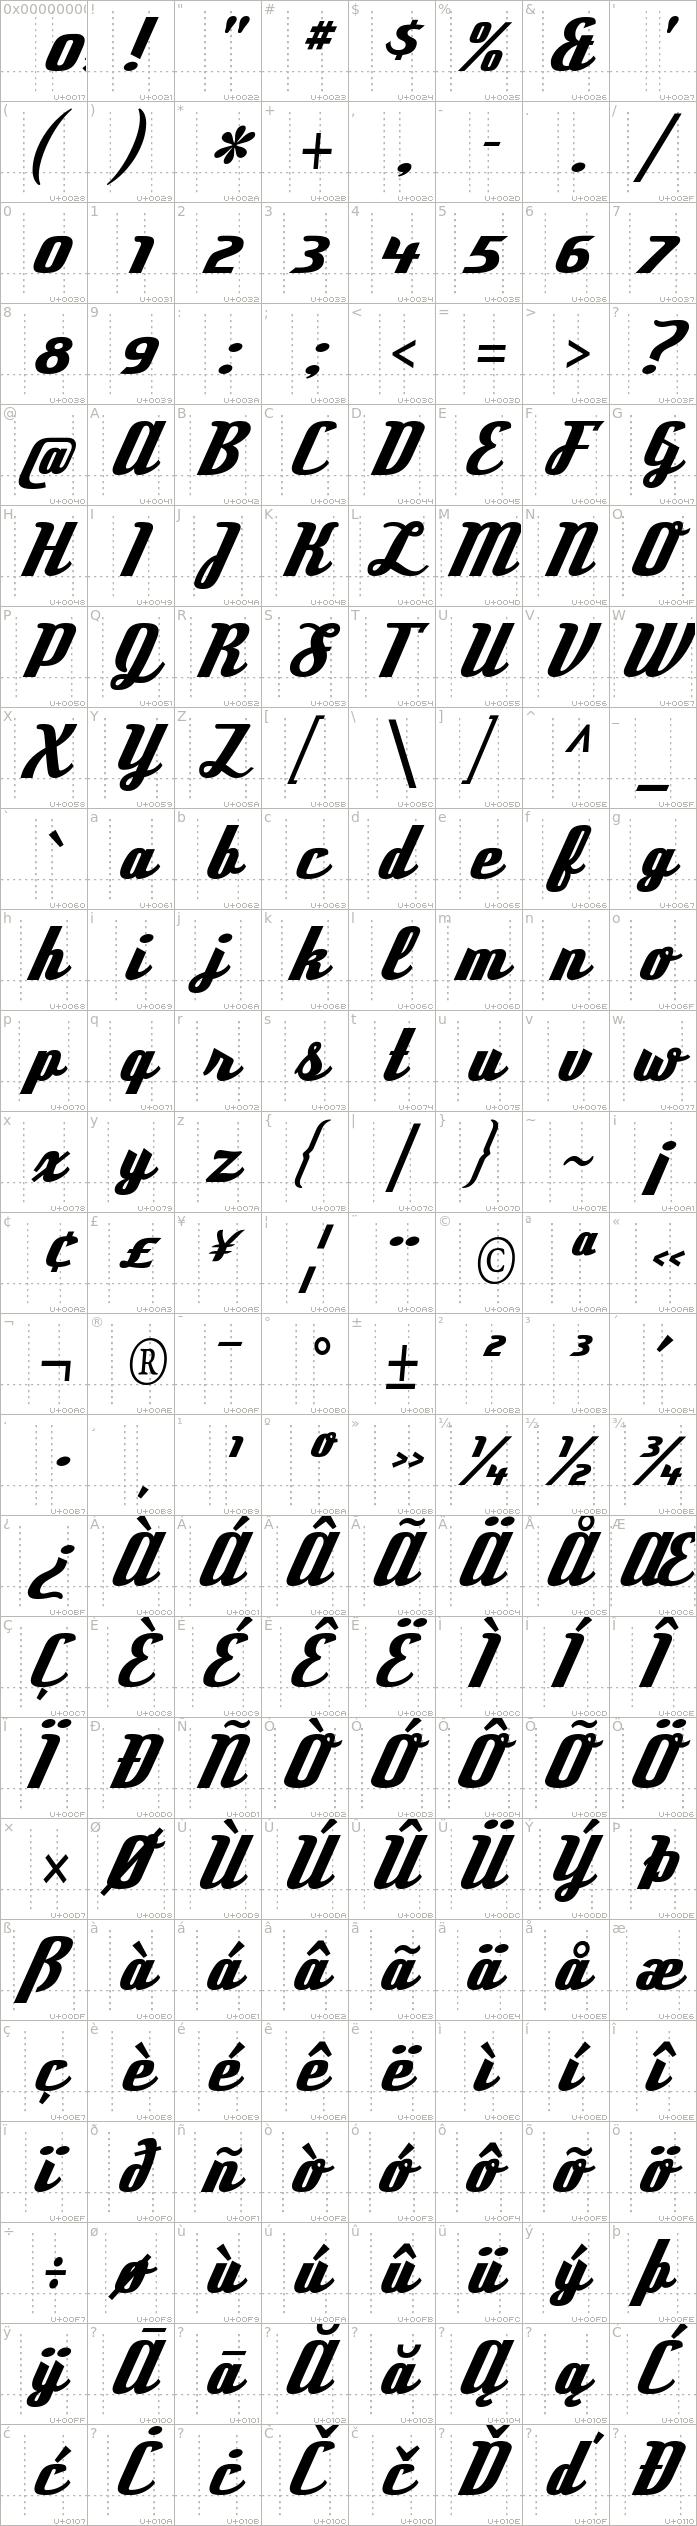 deftone-stylus.regular.character-map-1